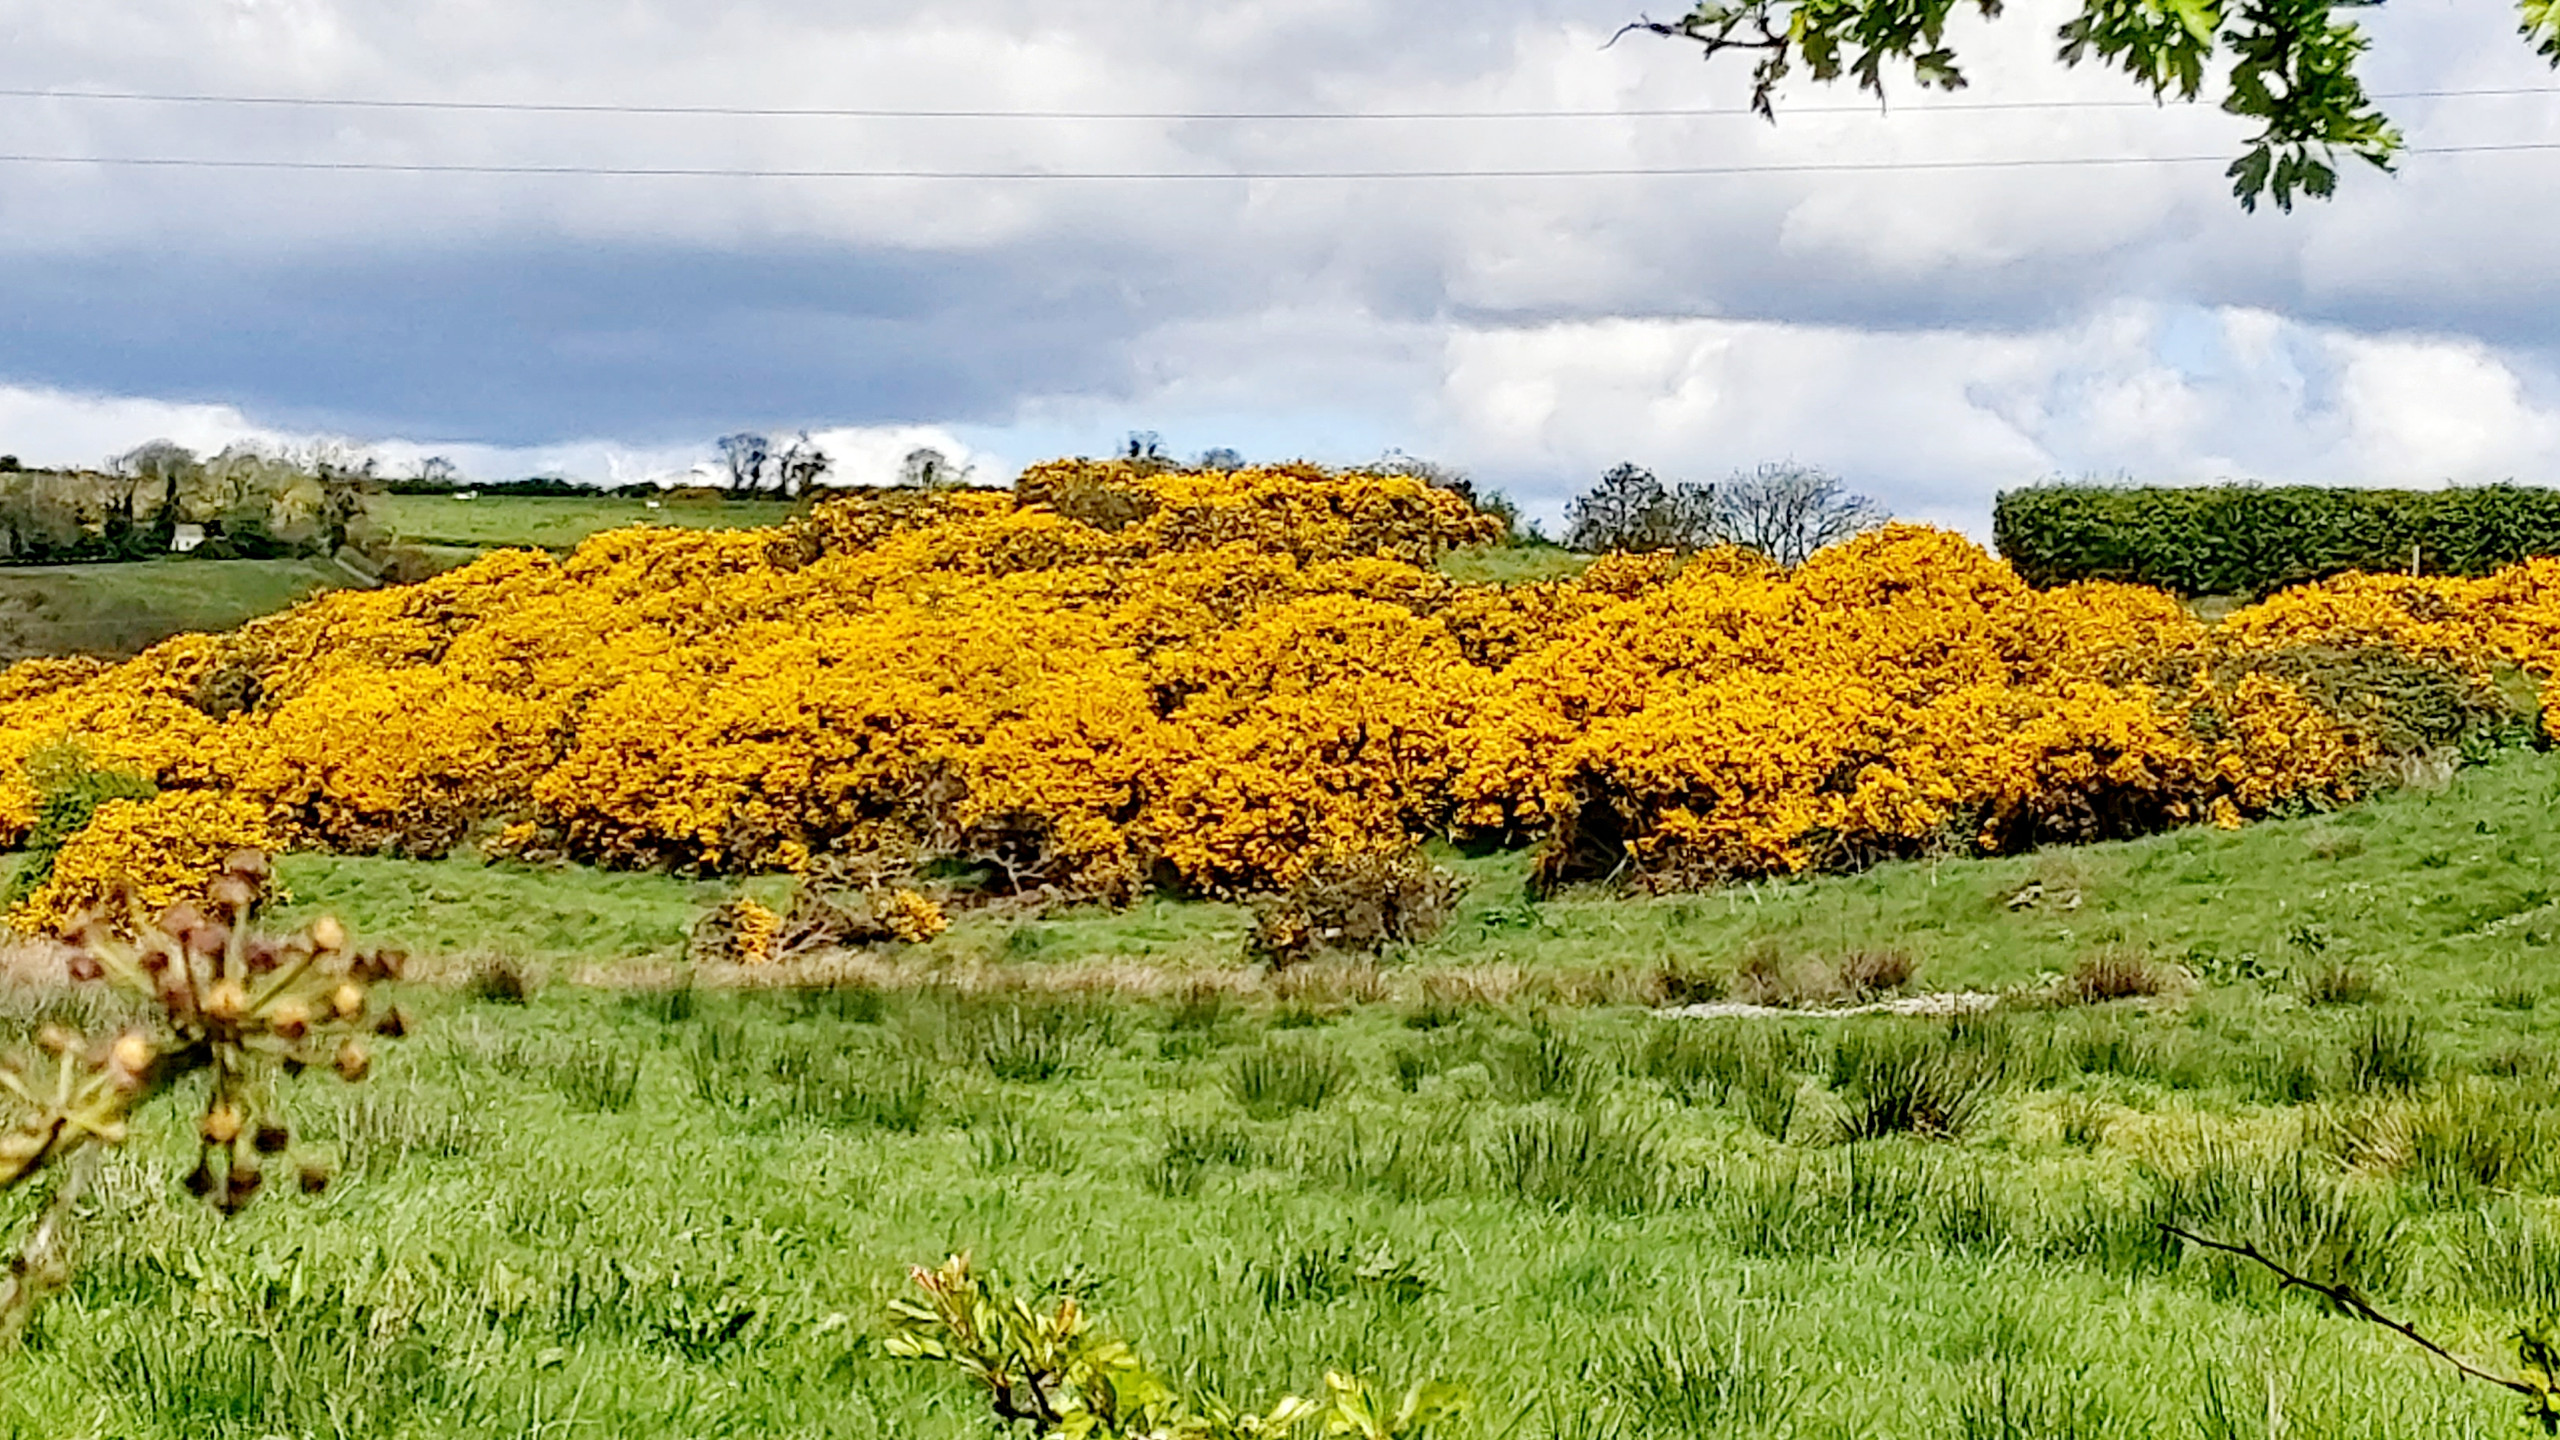 swathe of yellow gorse